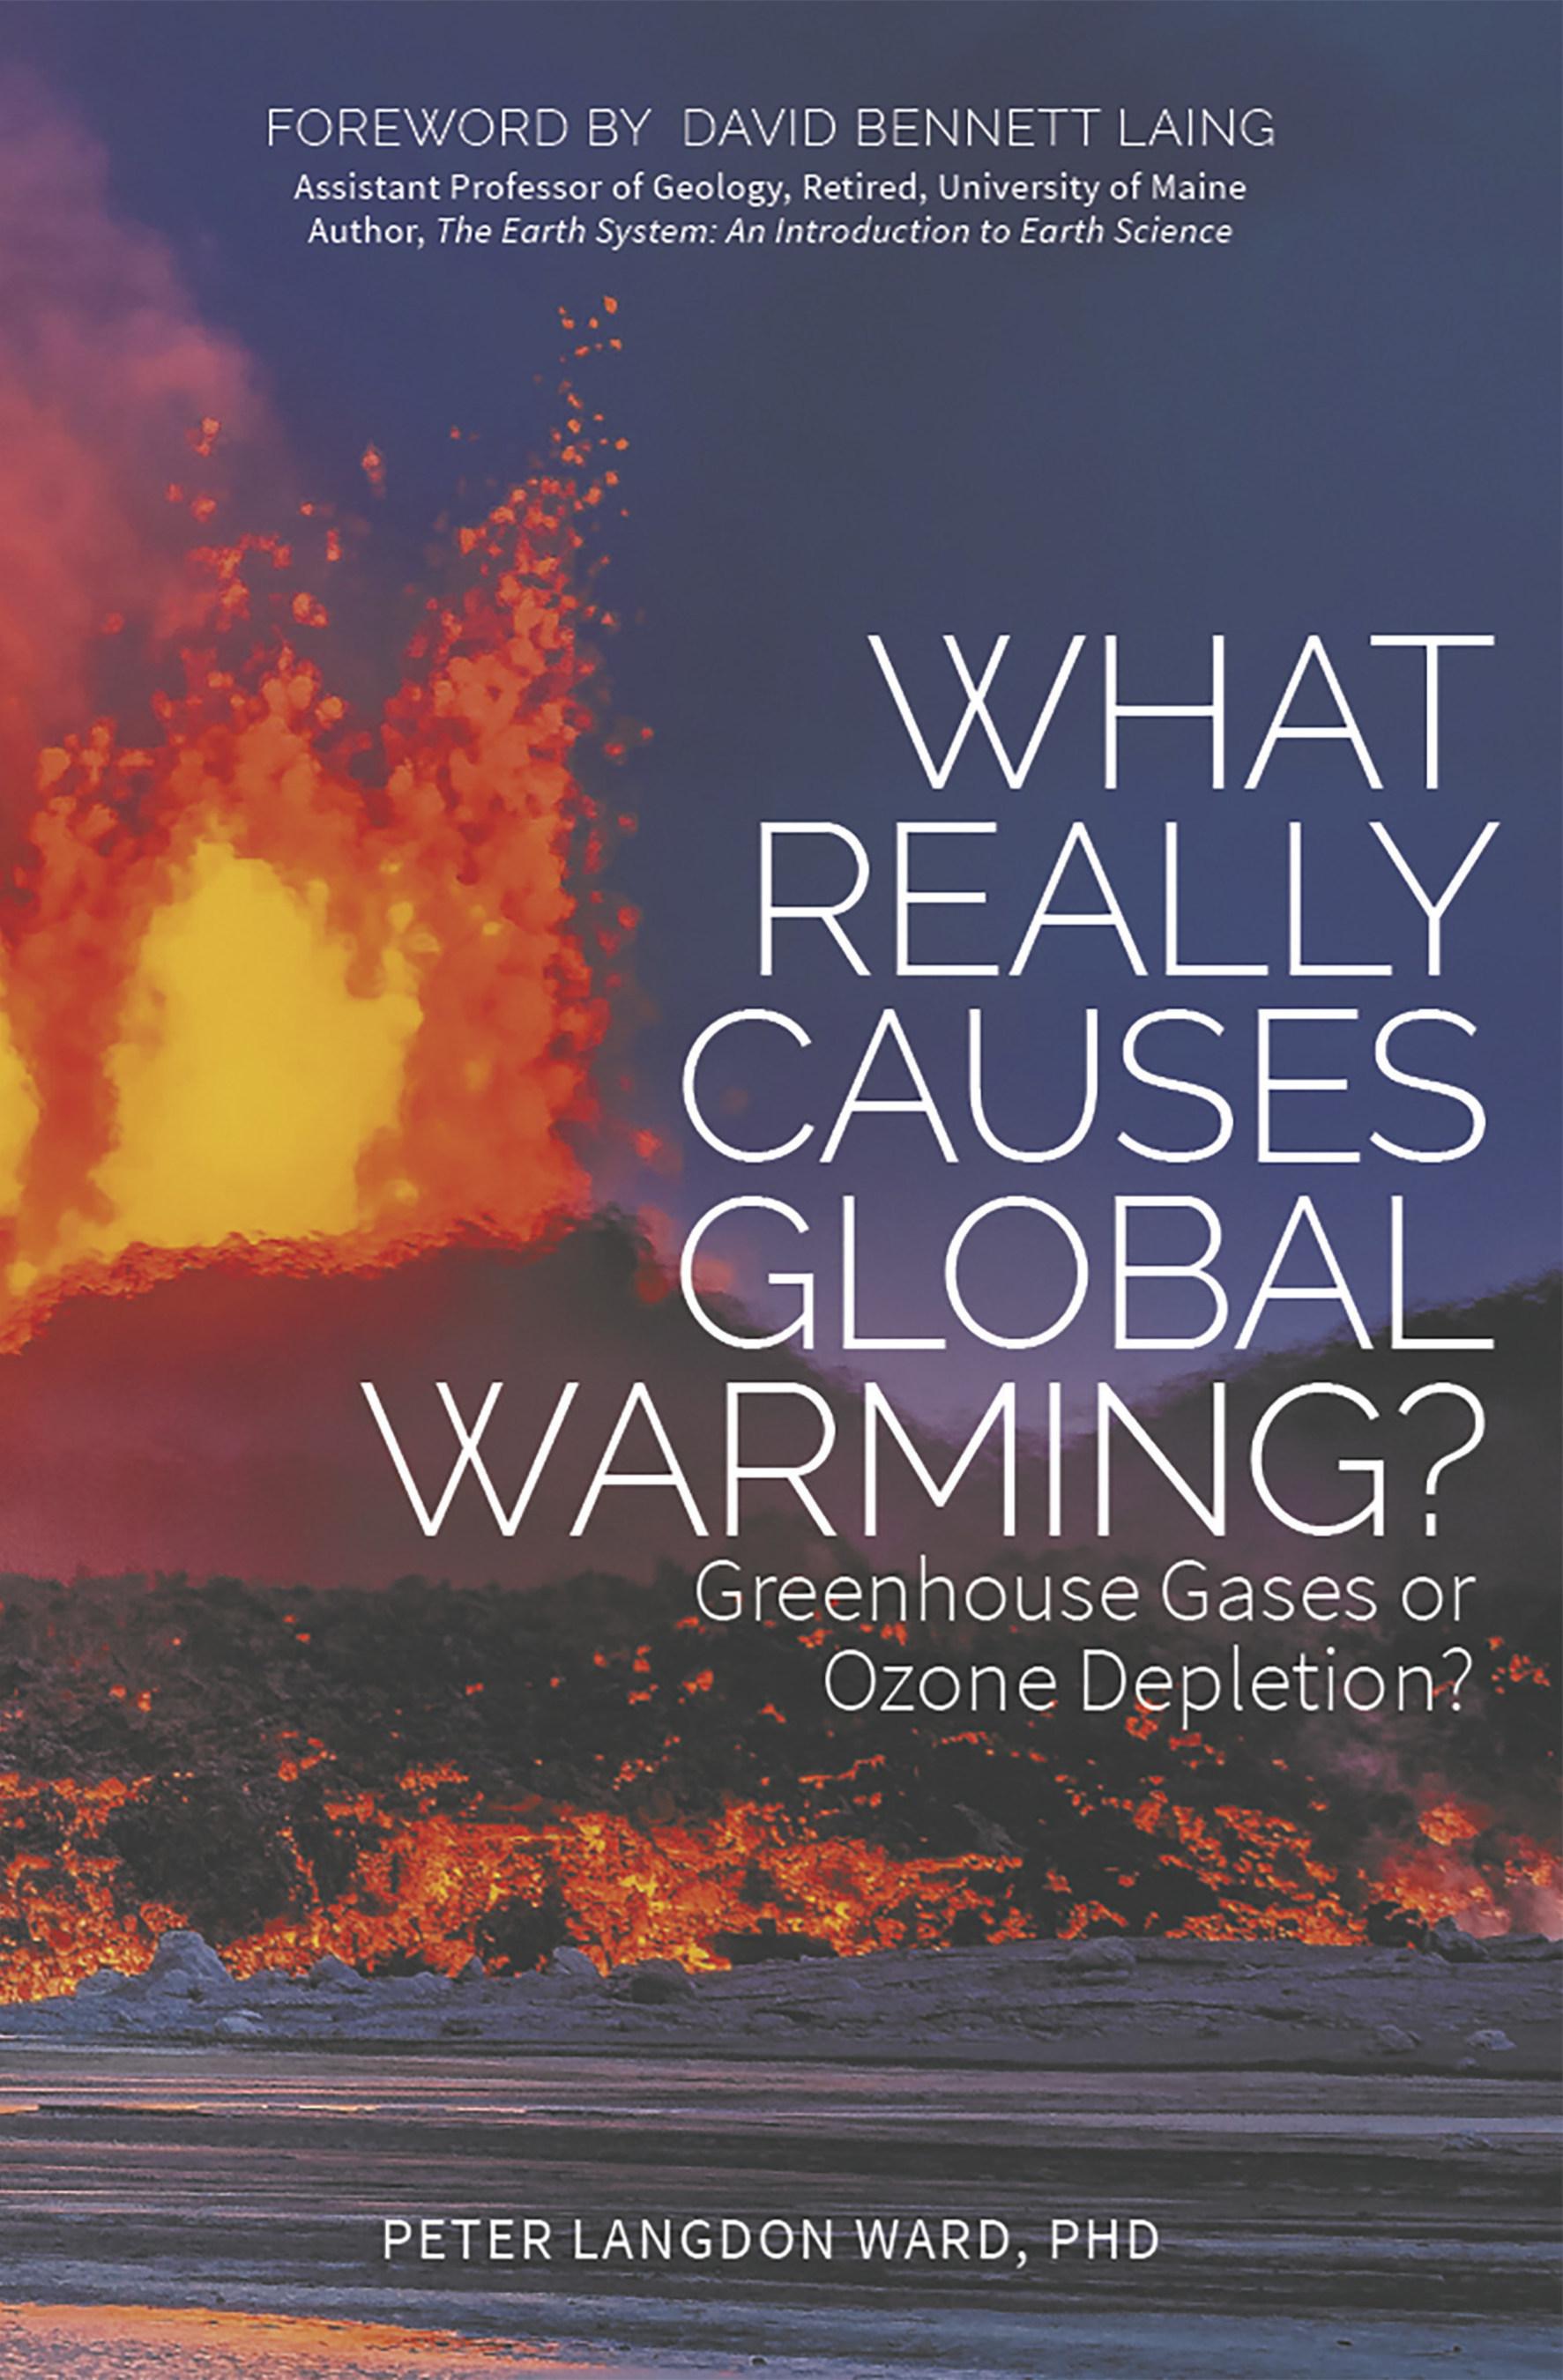 Whistle-Blower U.S. Geophysicist Issues $10,000 Challenge